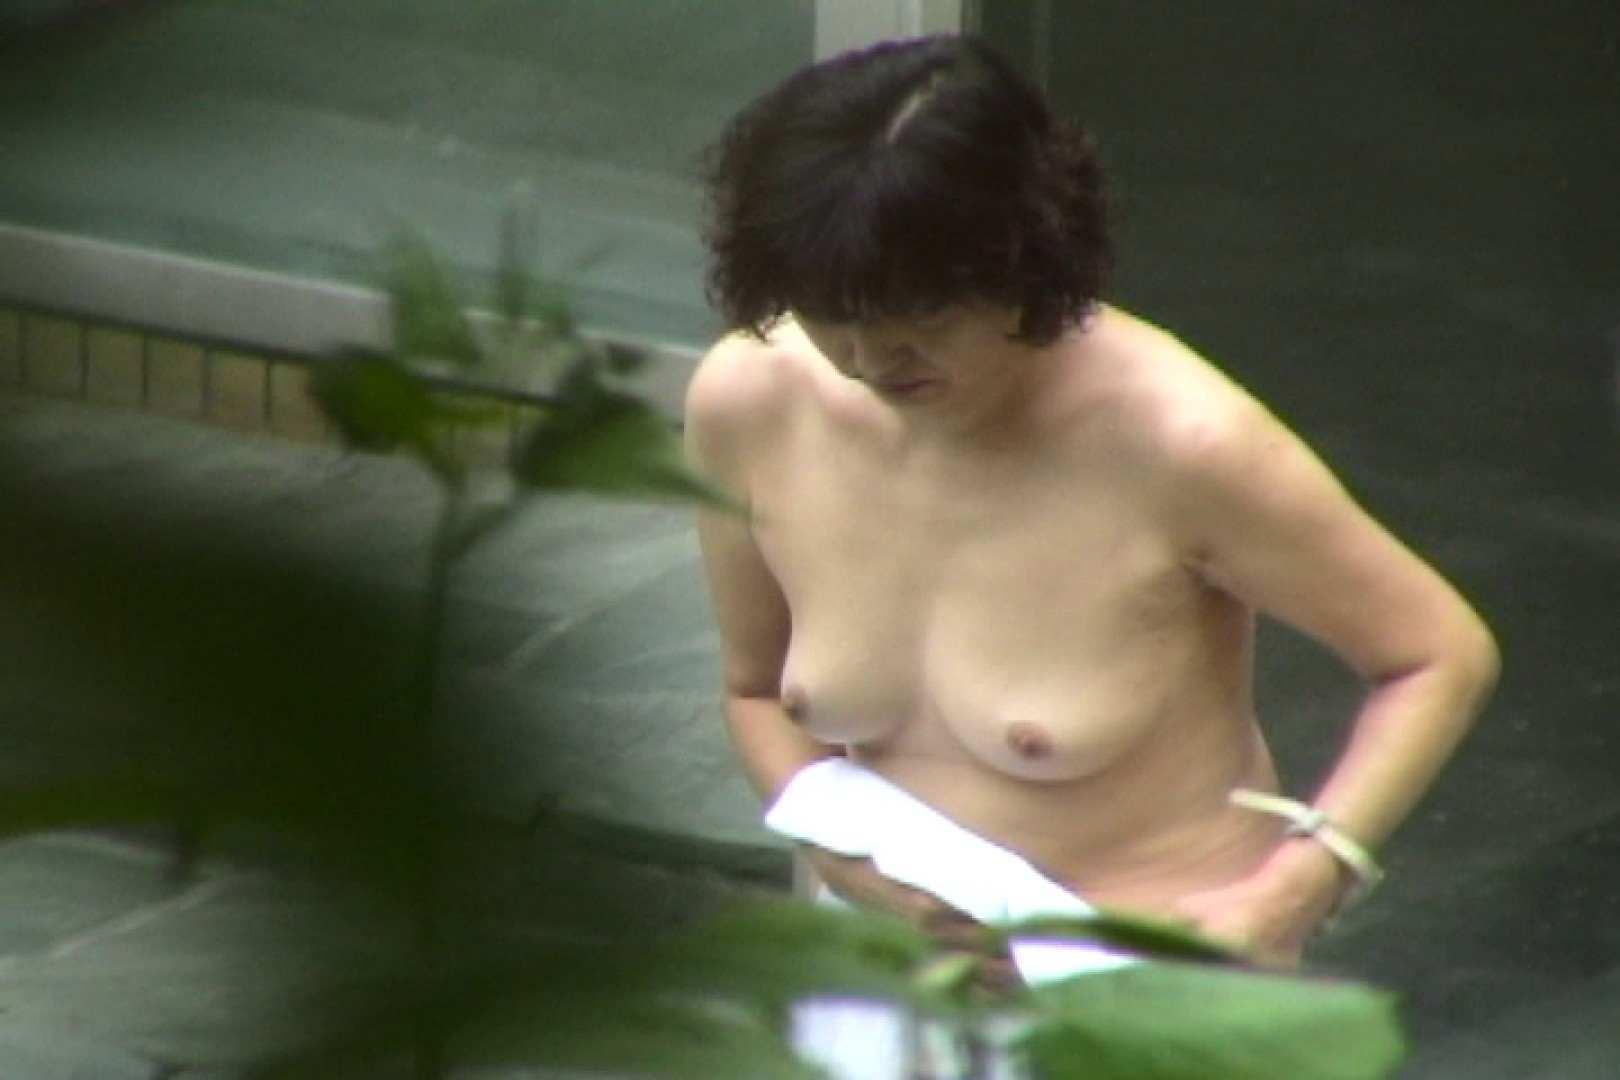 Aquaな露天風呂Vol.447 露天風呂編  103PIX 6